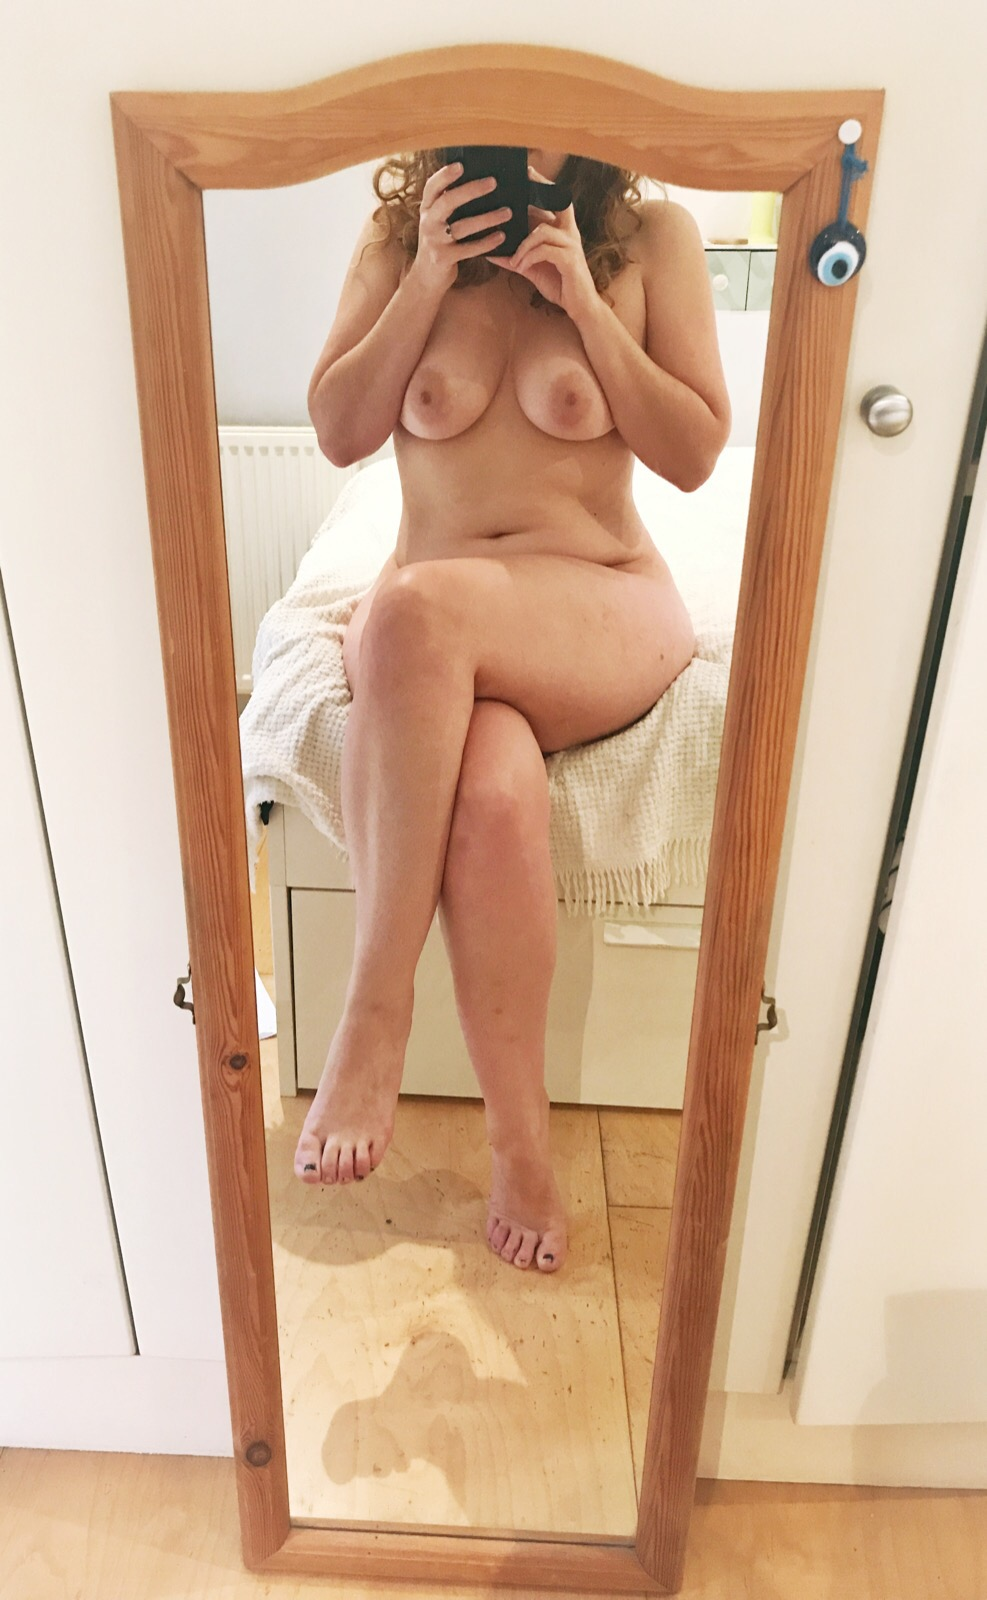 Naked Girl In Mirror